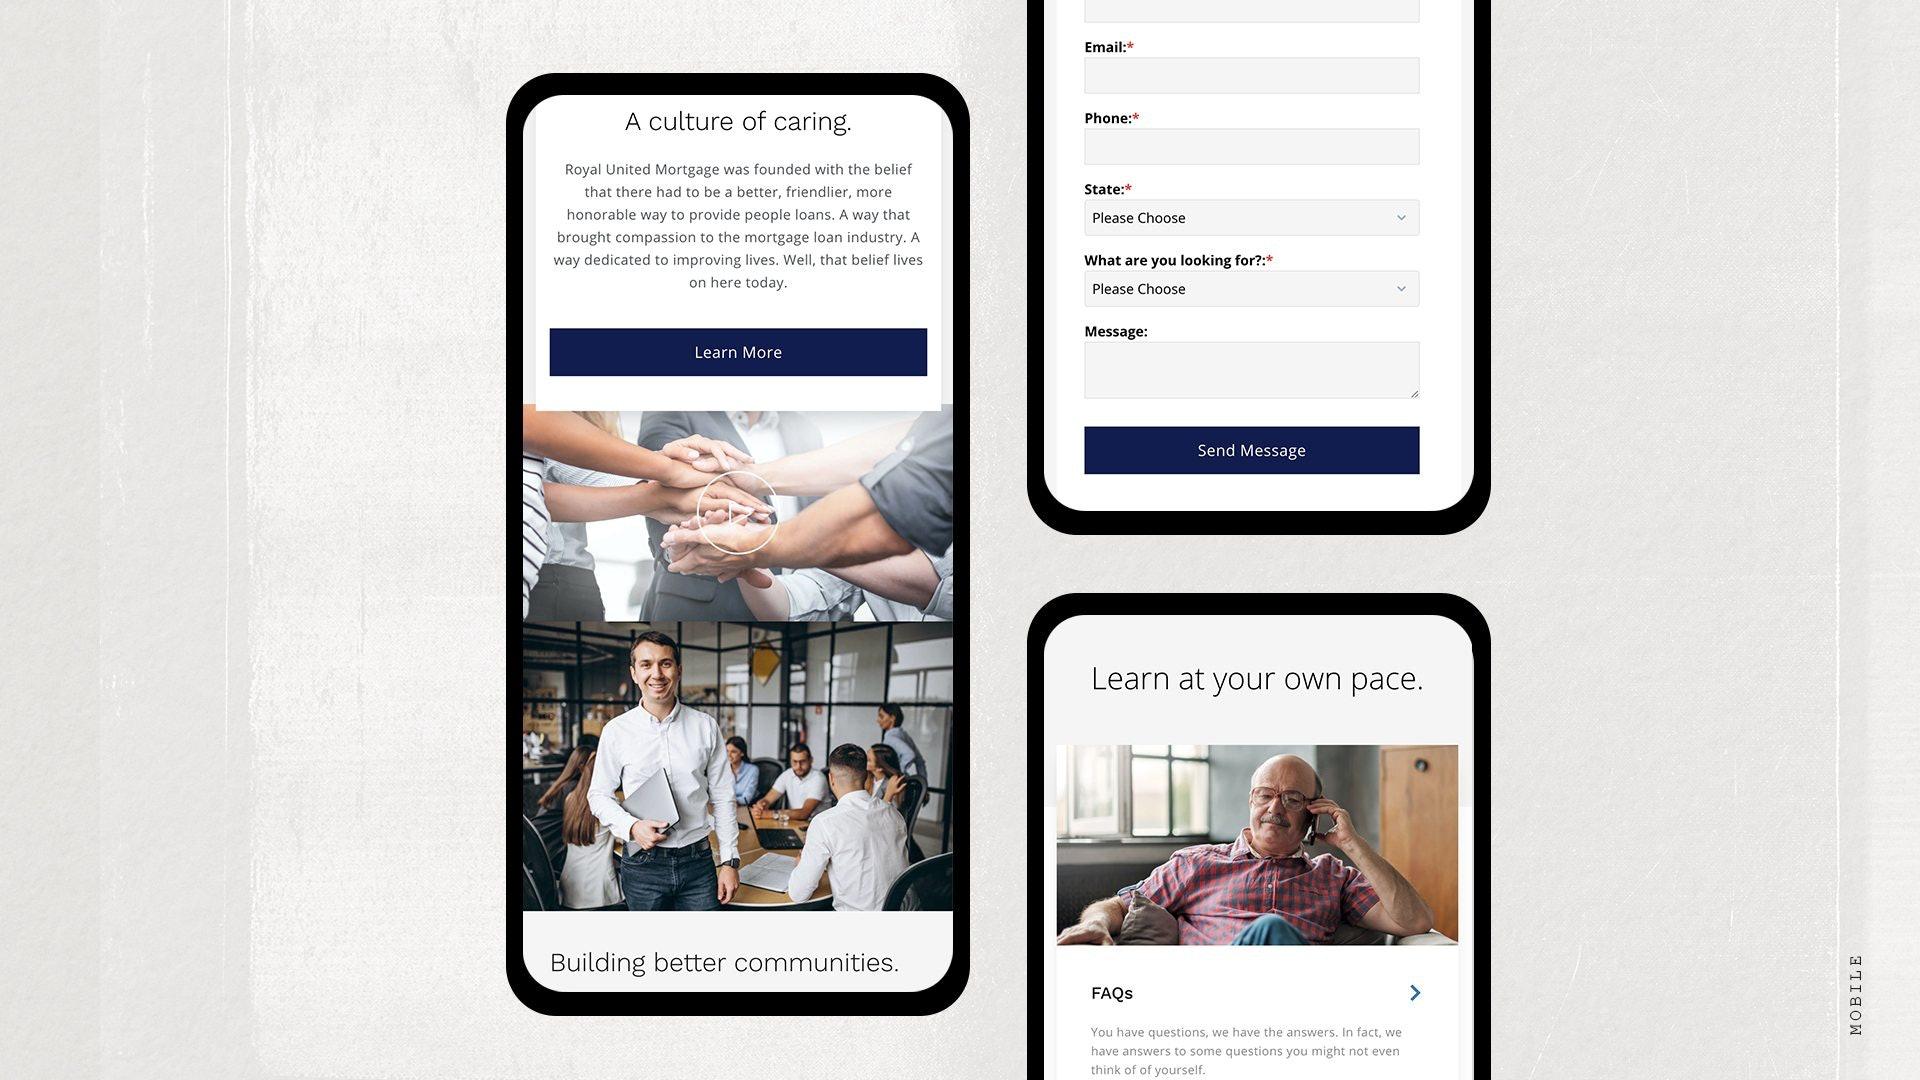 Royal United Mortgage Website on Smart Phone